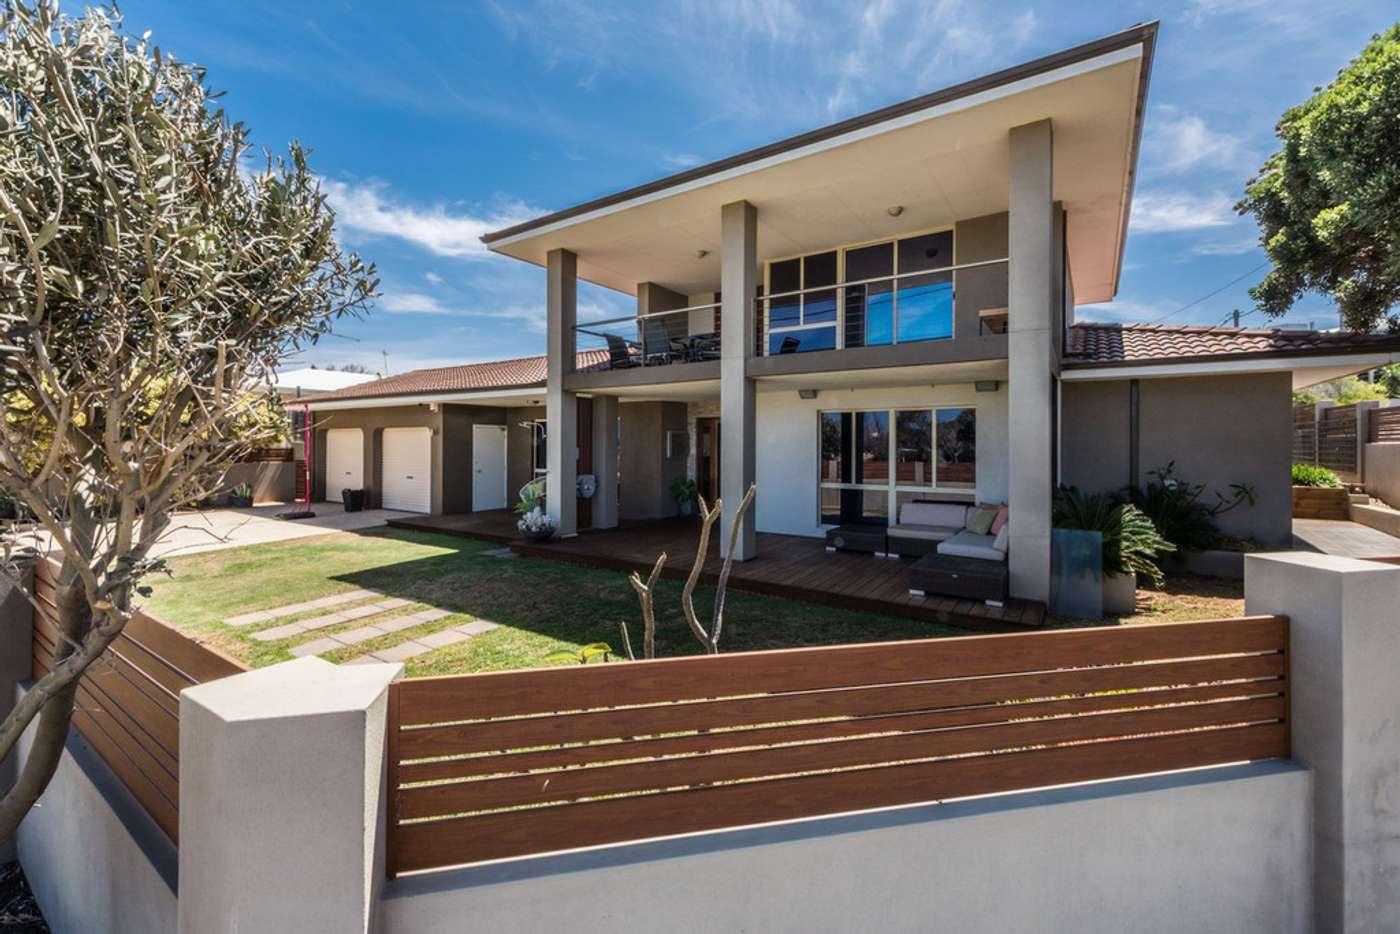 Main view of Homely house listing, 21 Blackburn Crescent, Tarcoola Beach WA 6530